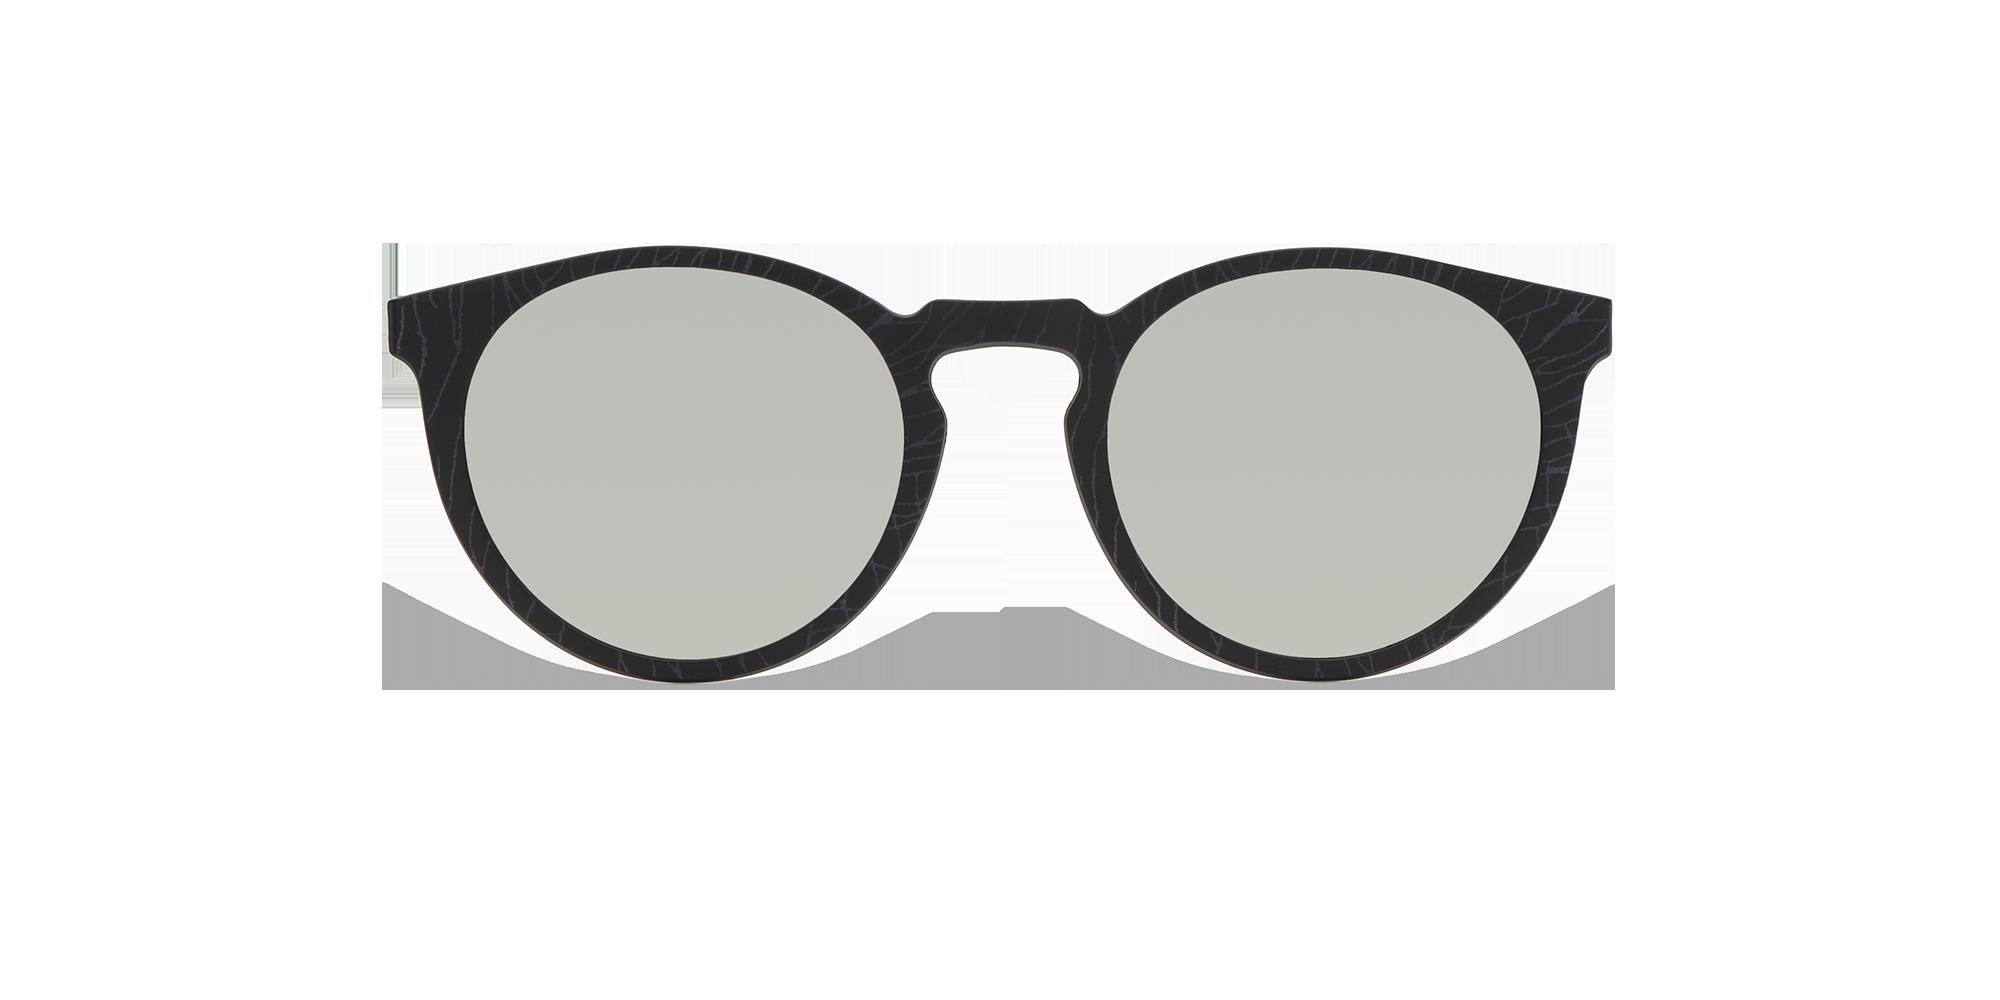 afflelou/france/products/smart_clip/clips_glasses/TMK35R3BK014820.png